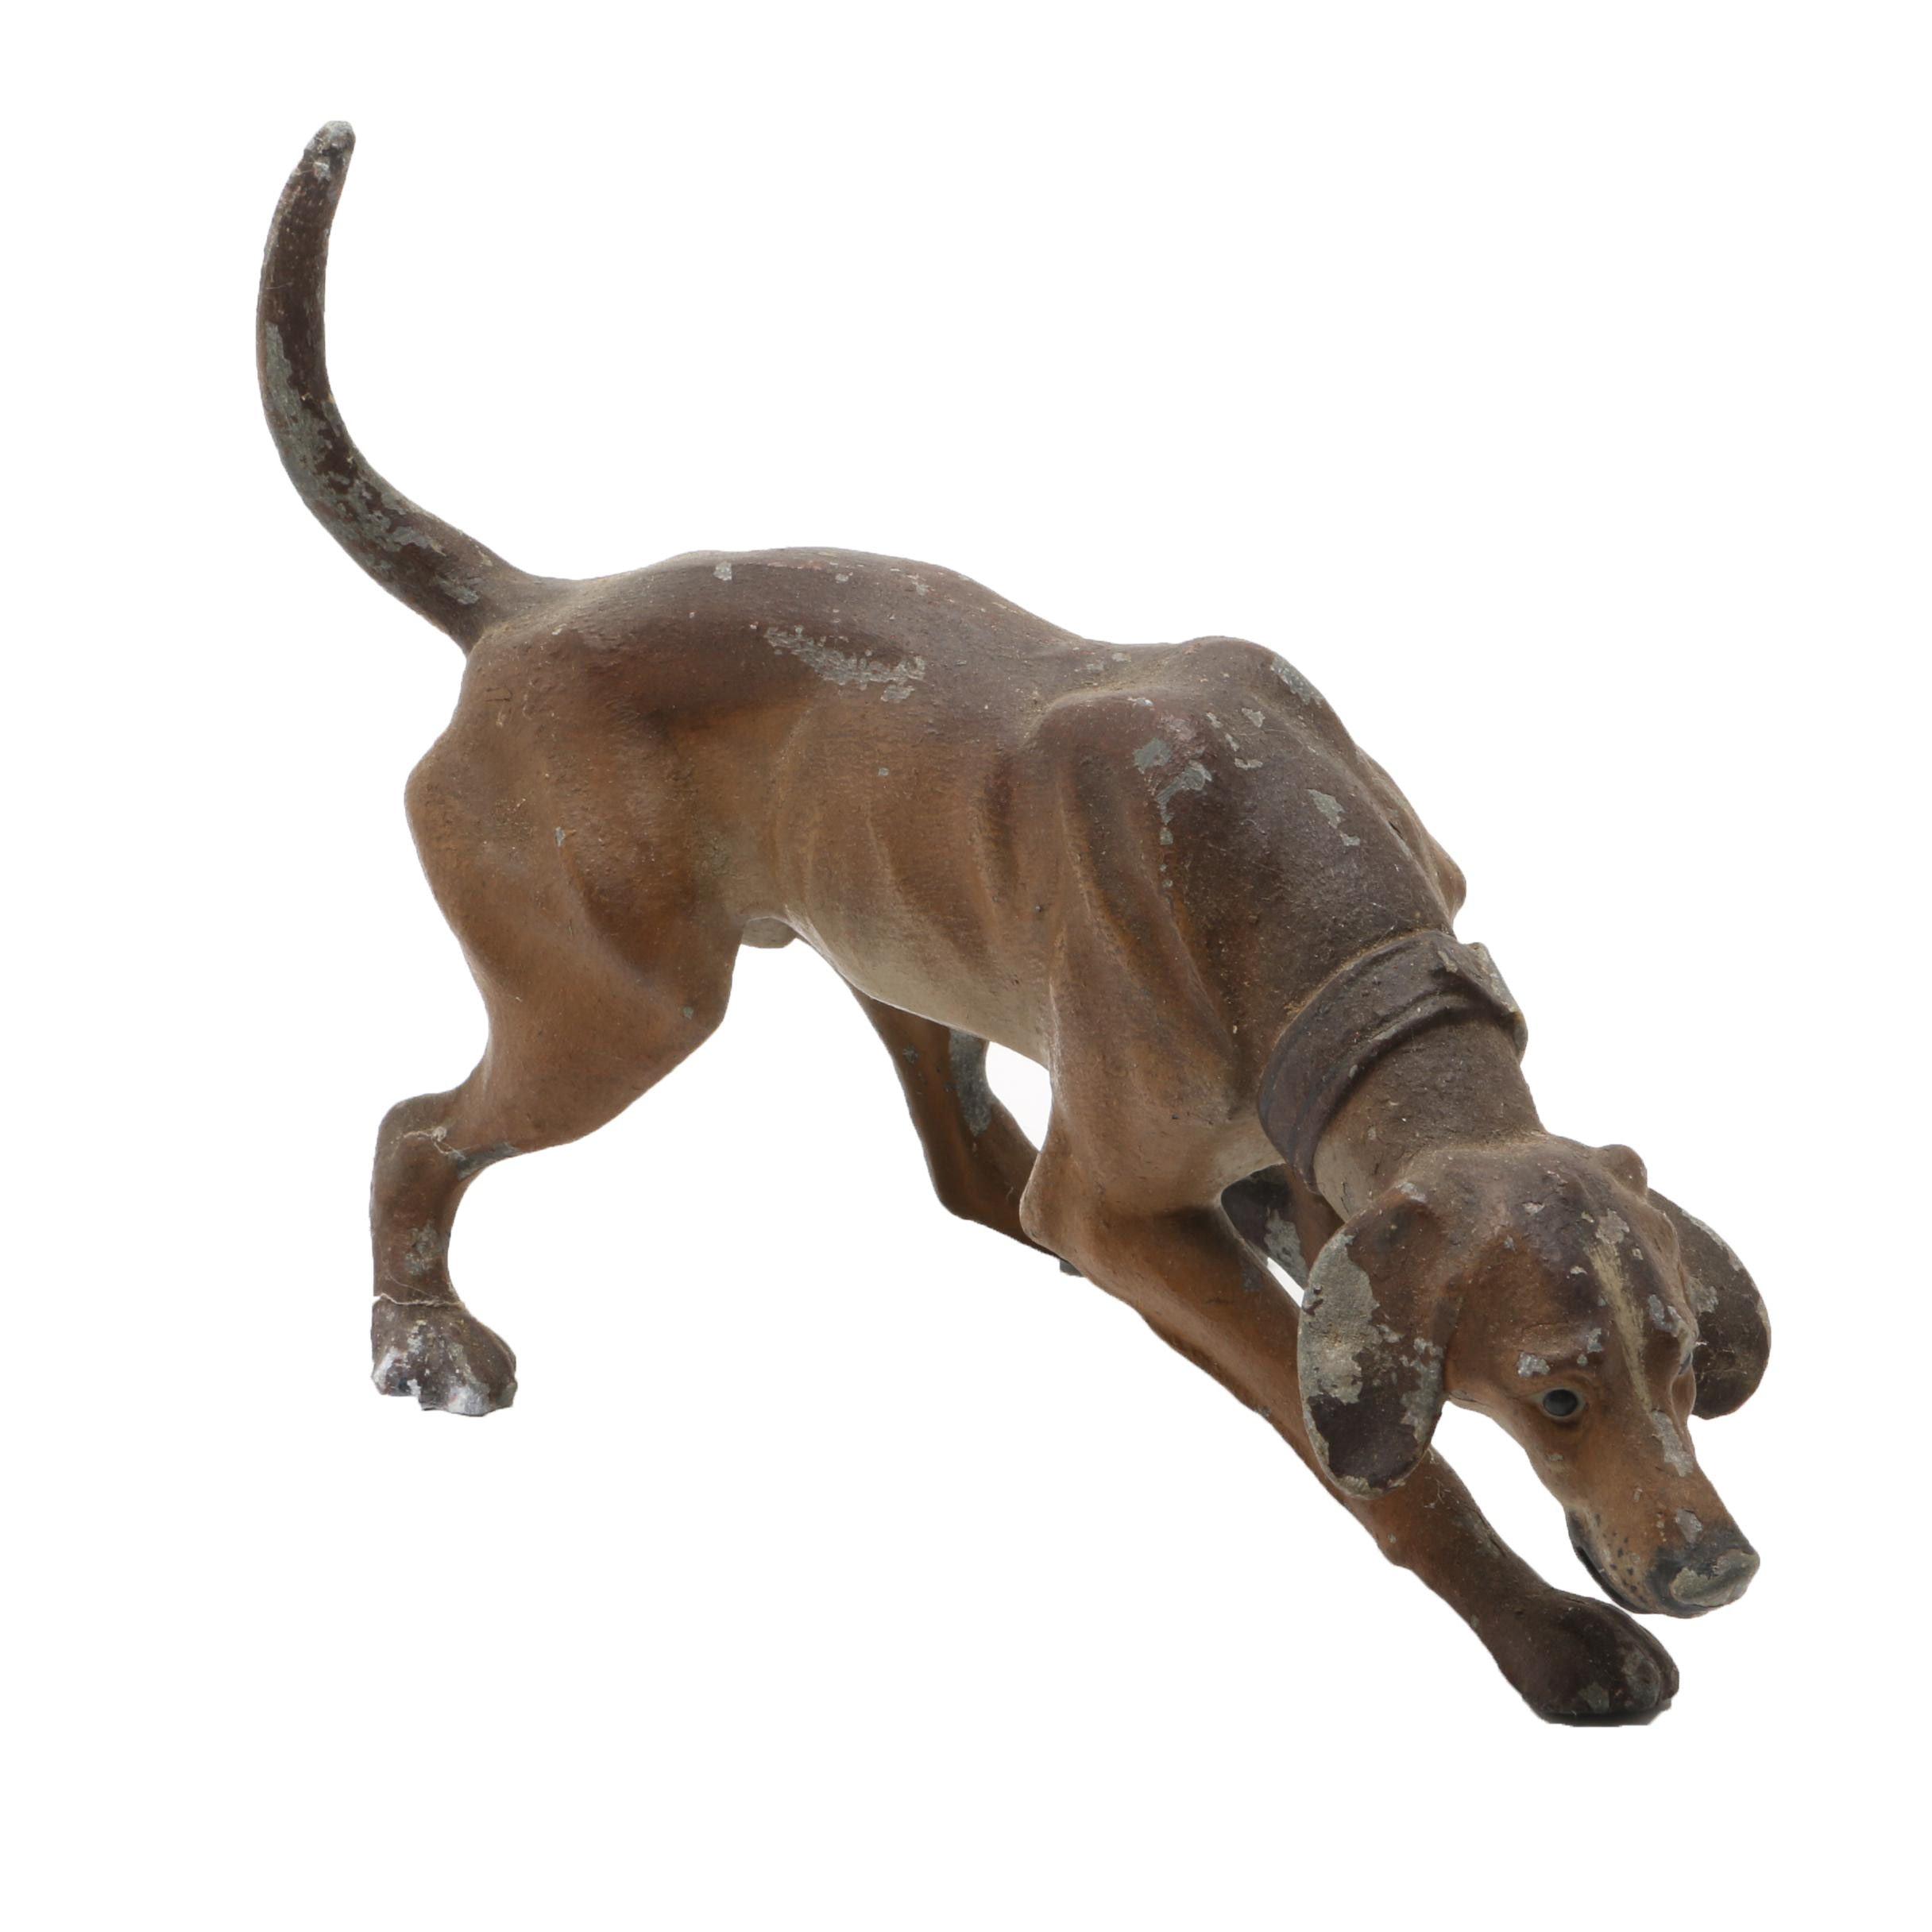 Vintage Cast Metal Hunting Dog Figurine